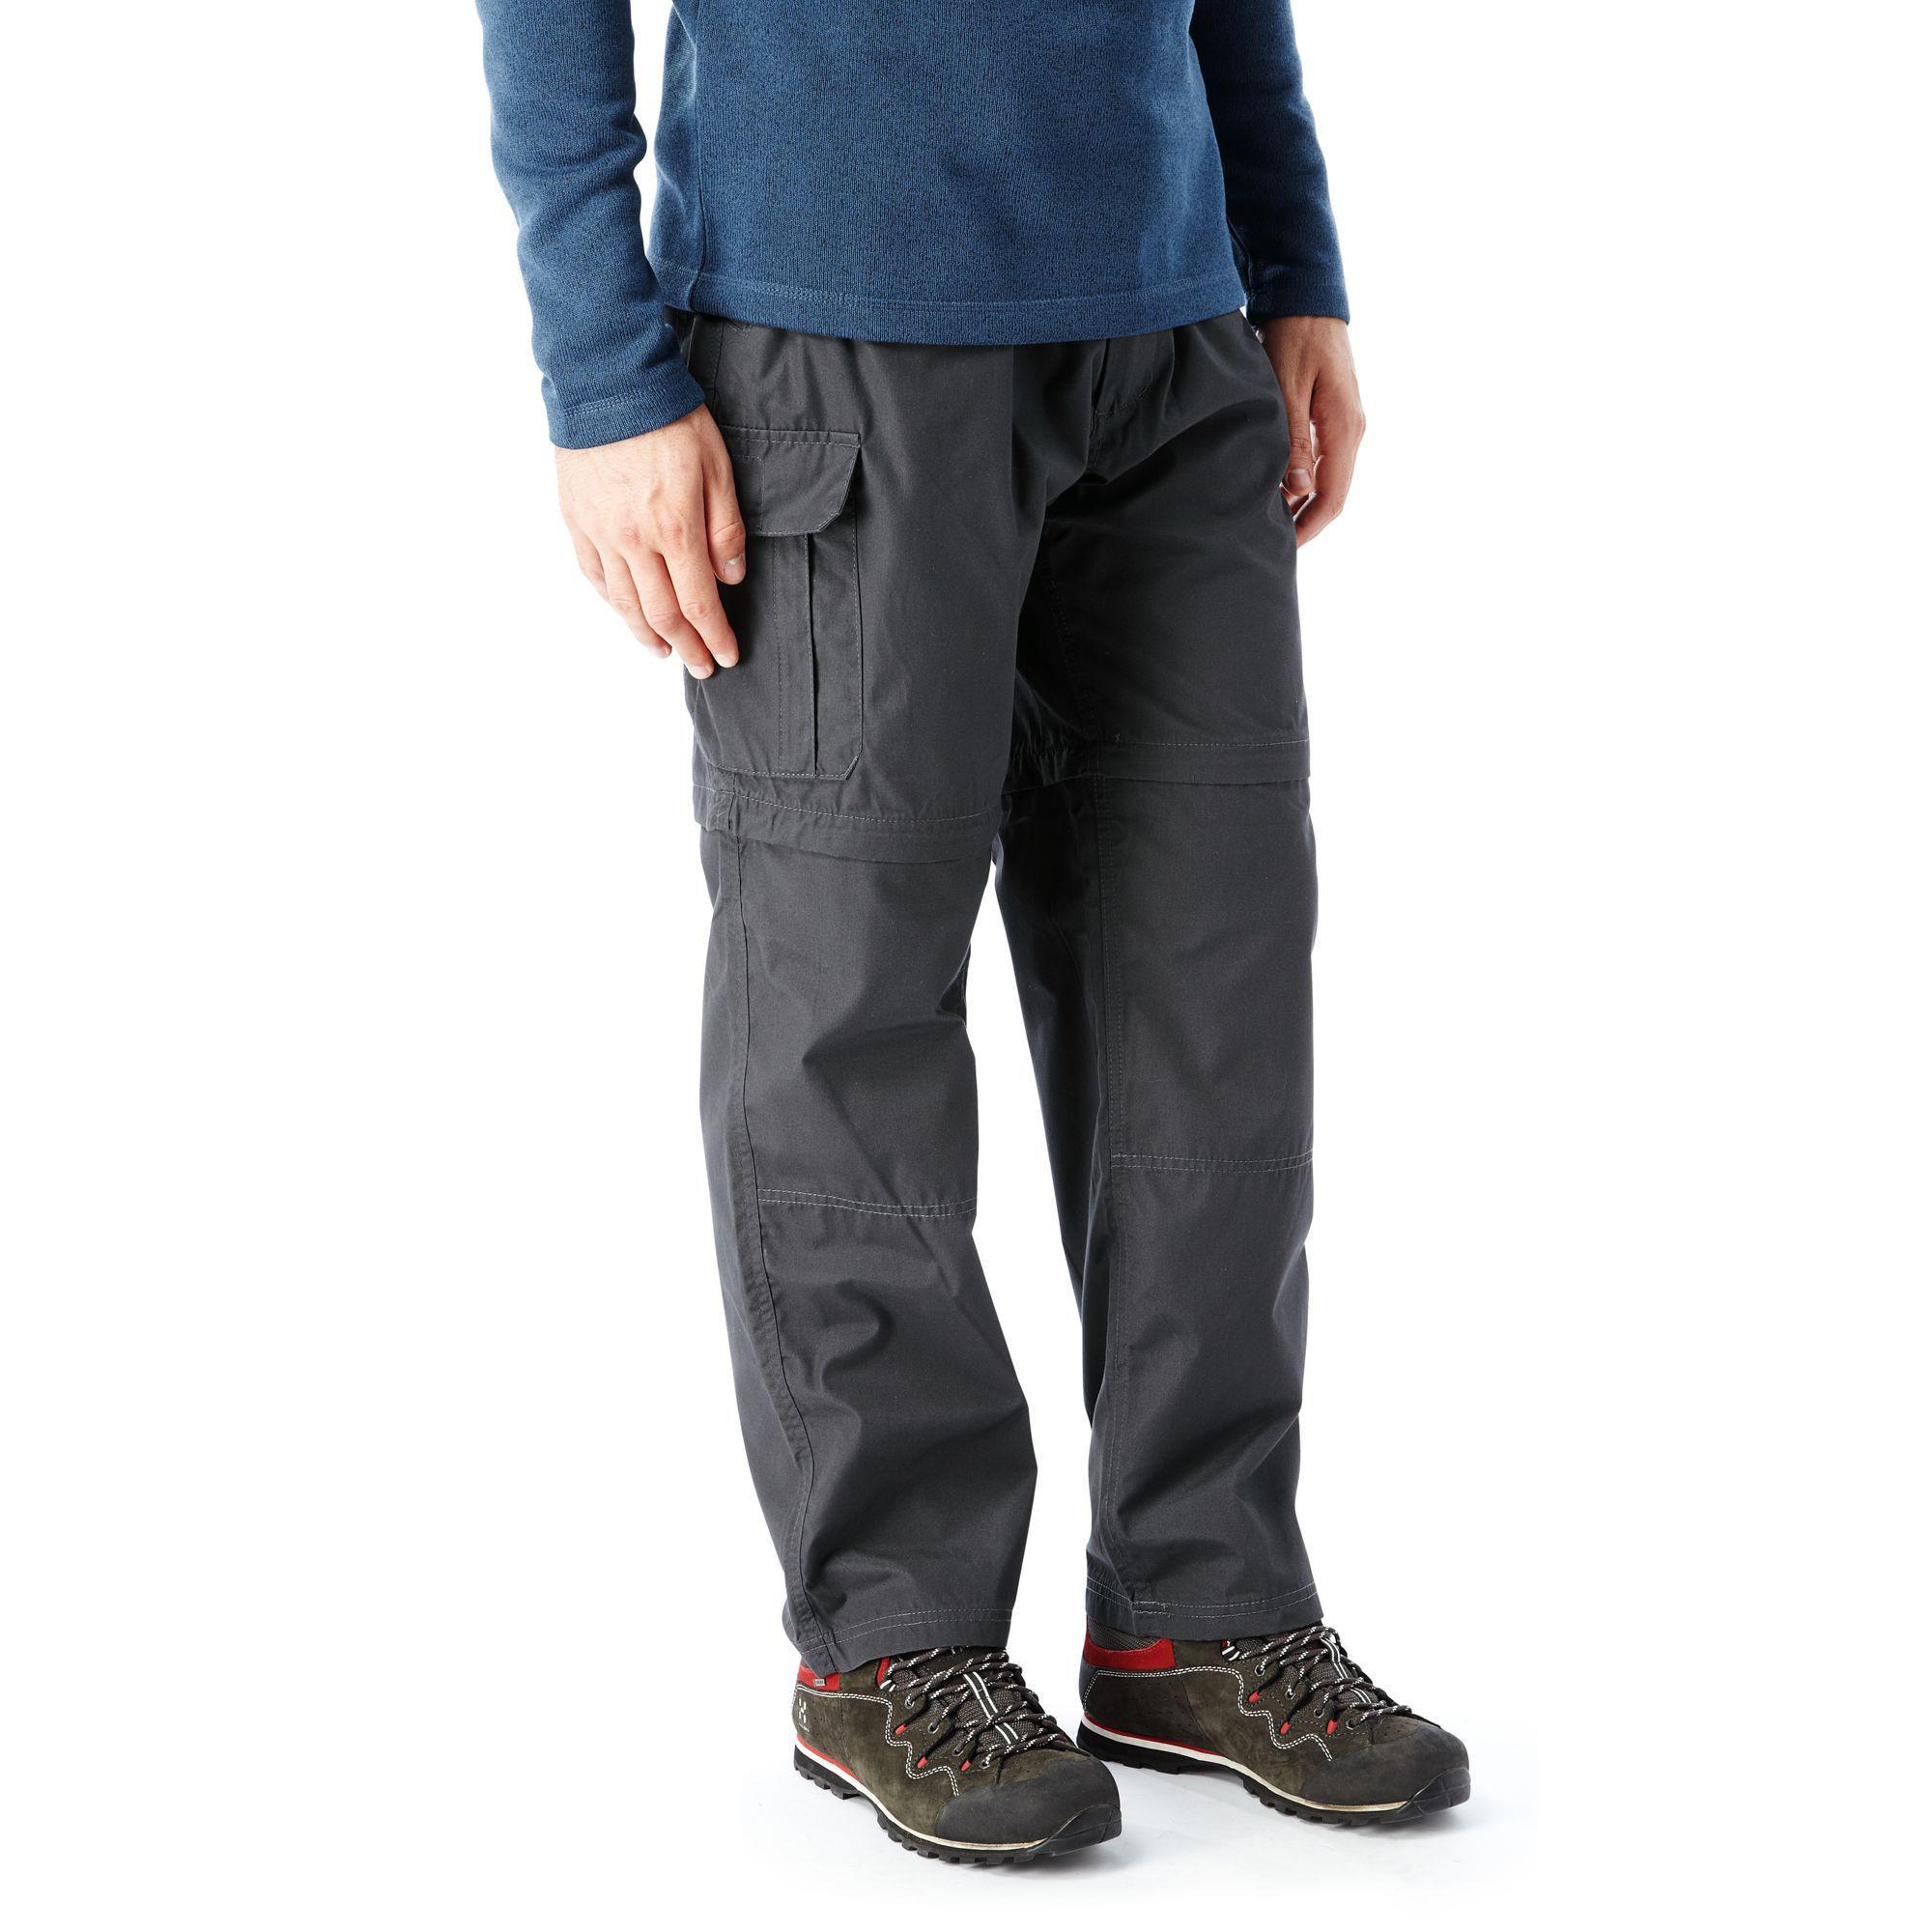 3886b7c5ce Craghoppers - Gray Black Pepper Kiwi Convertible Trousers for Men - Lyst